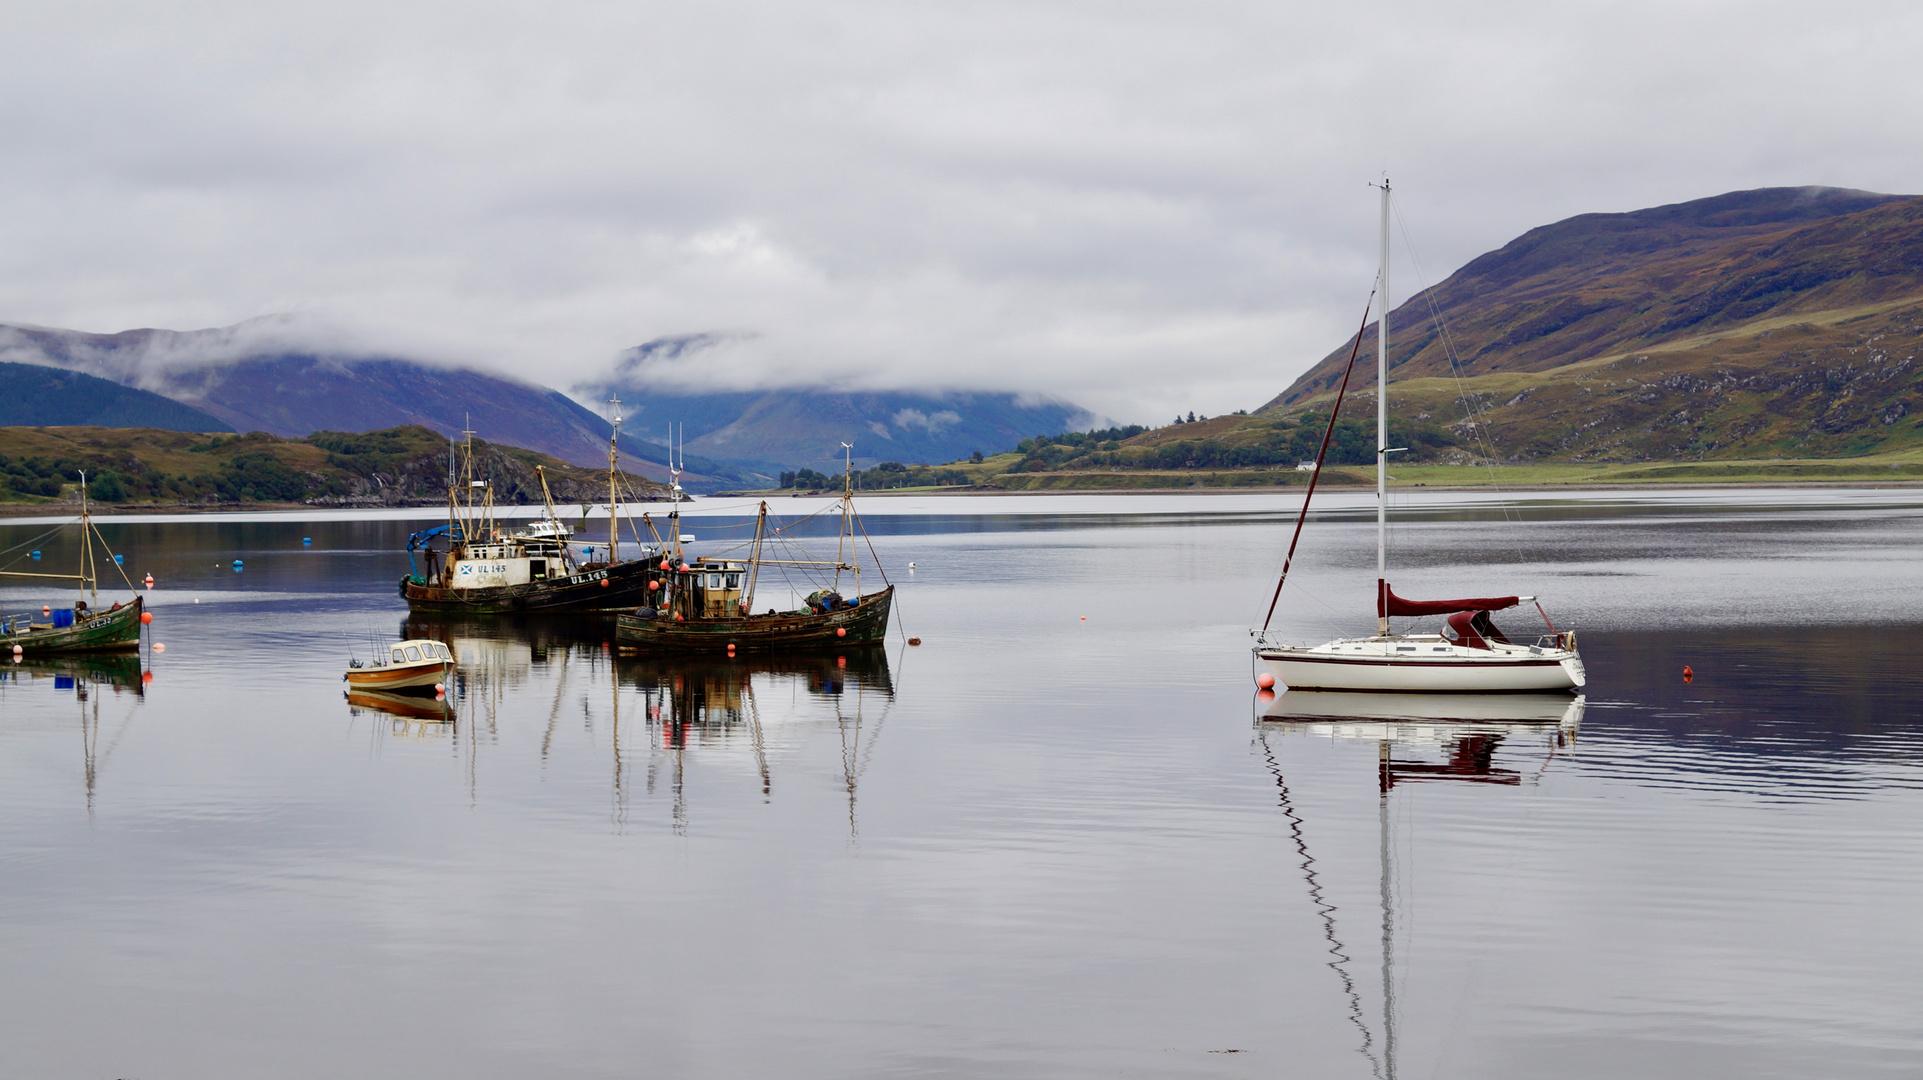 Scotland at its finest